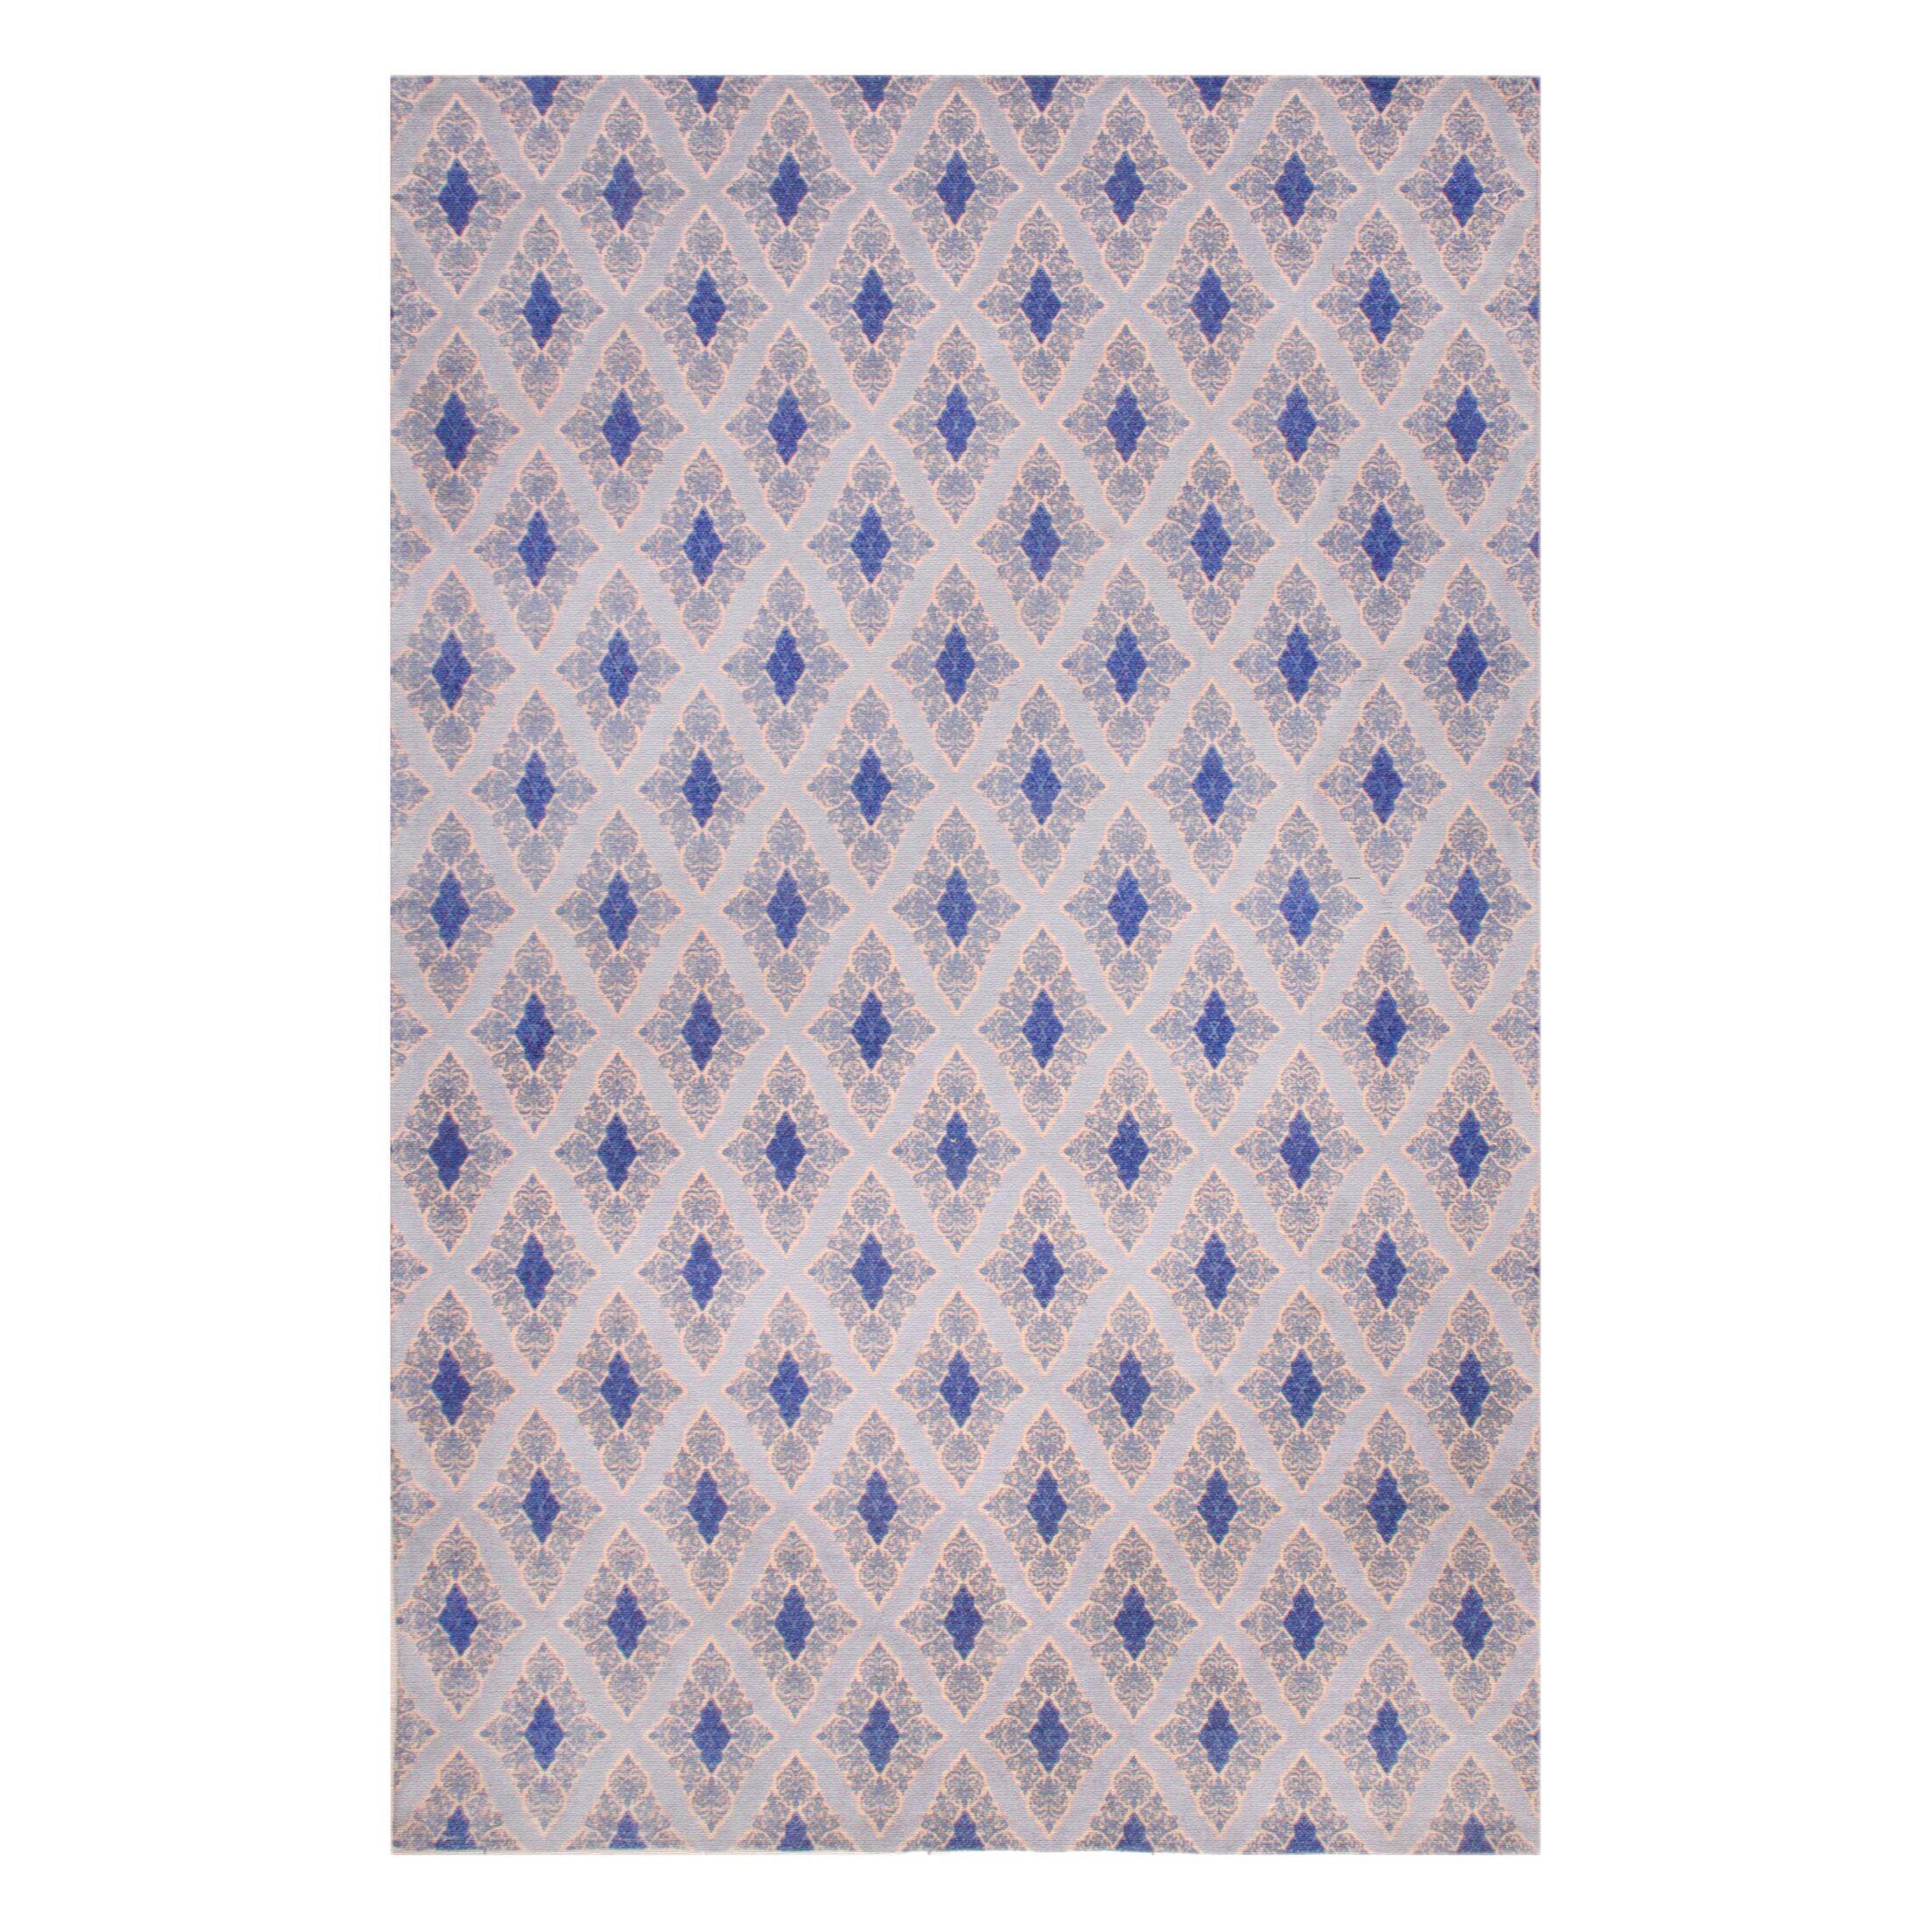 Rosalida Hand Woven Blue Area Rug Rug Size: 5' x 8'